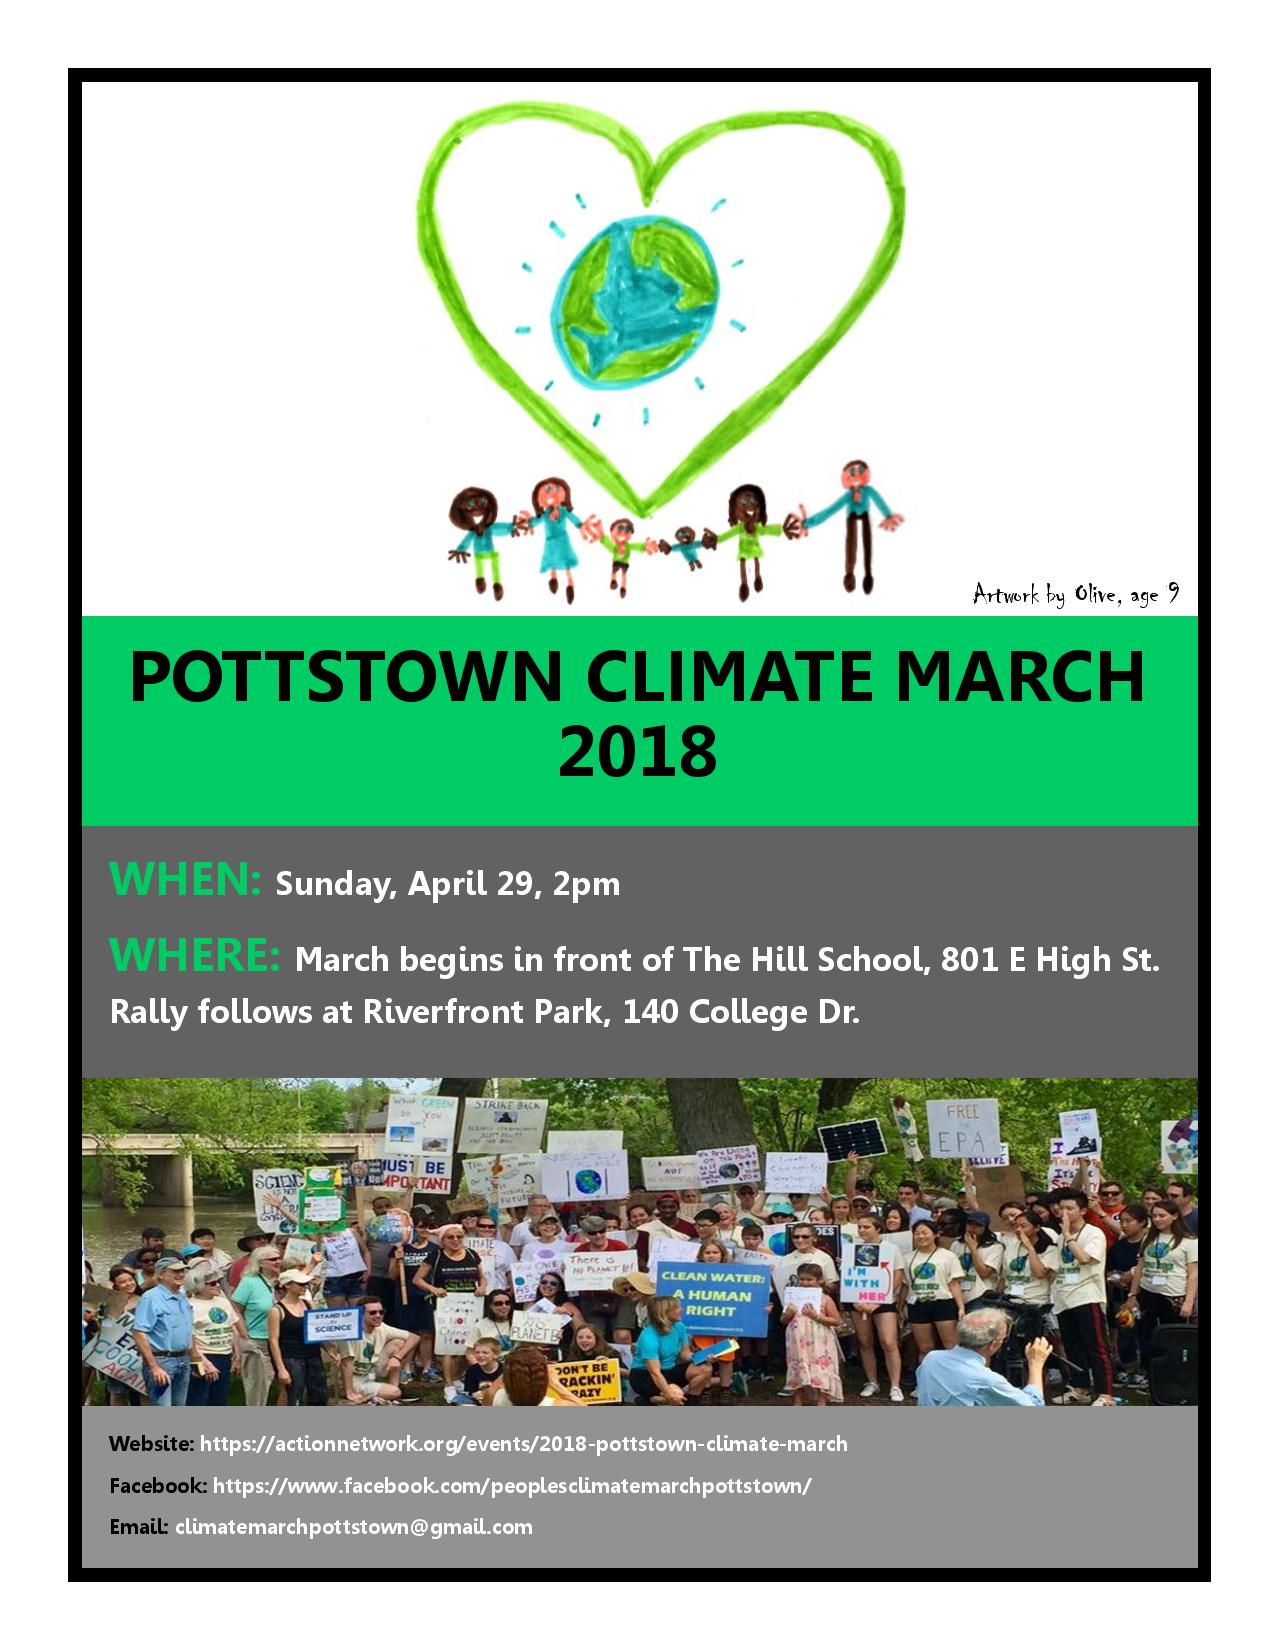 PottstownClimateMarch2018 flyer (1)-page-001.jpg